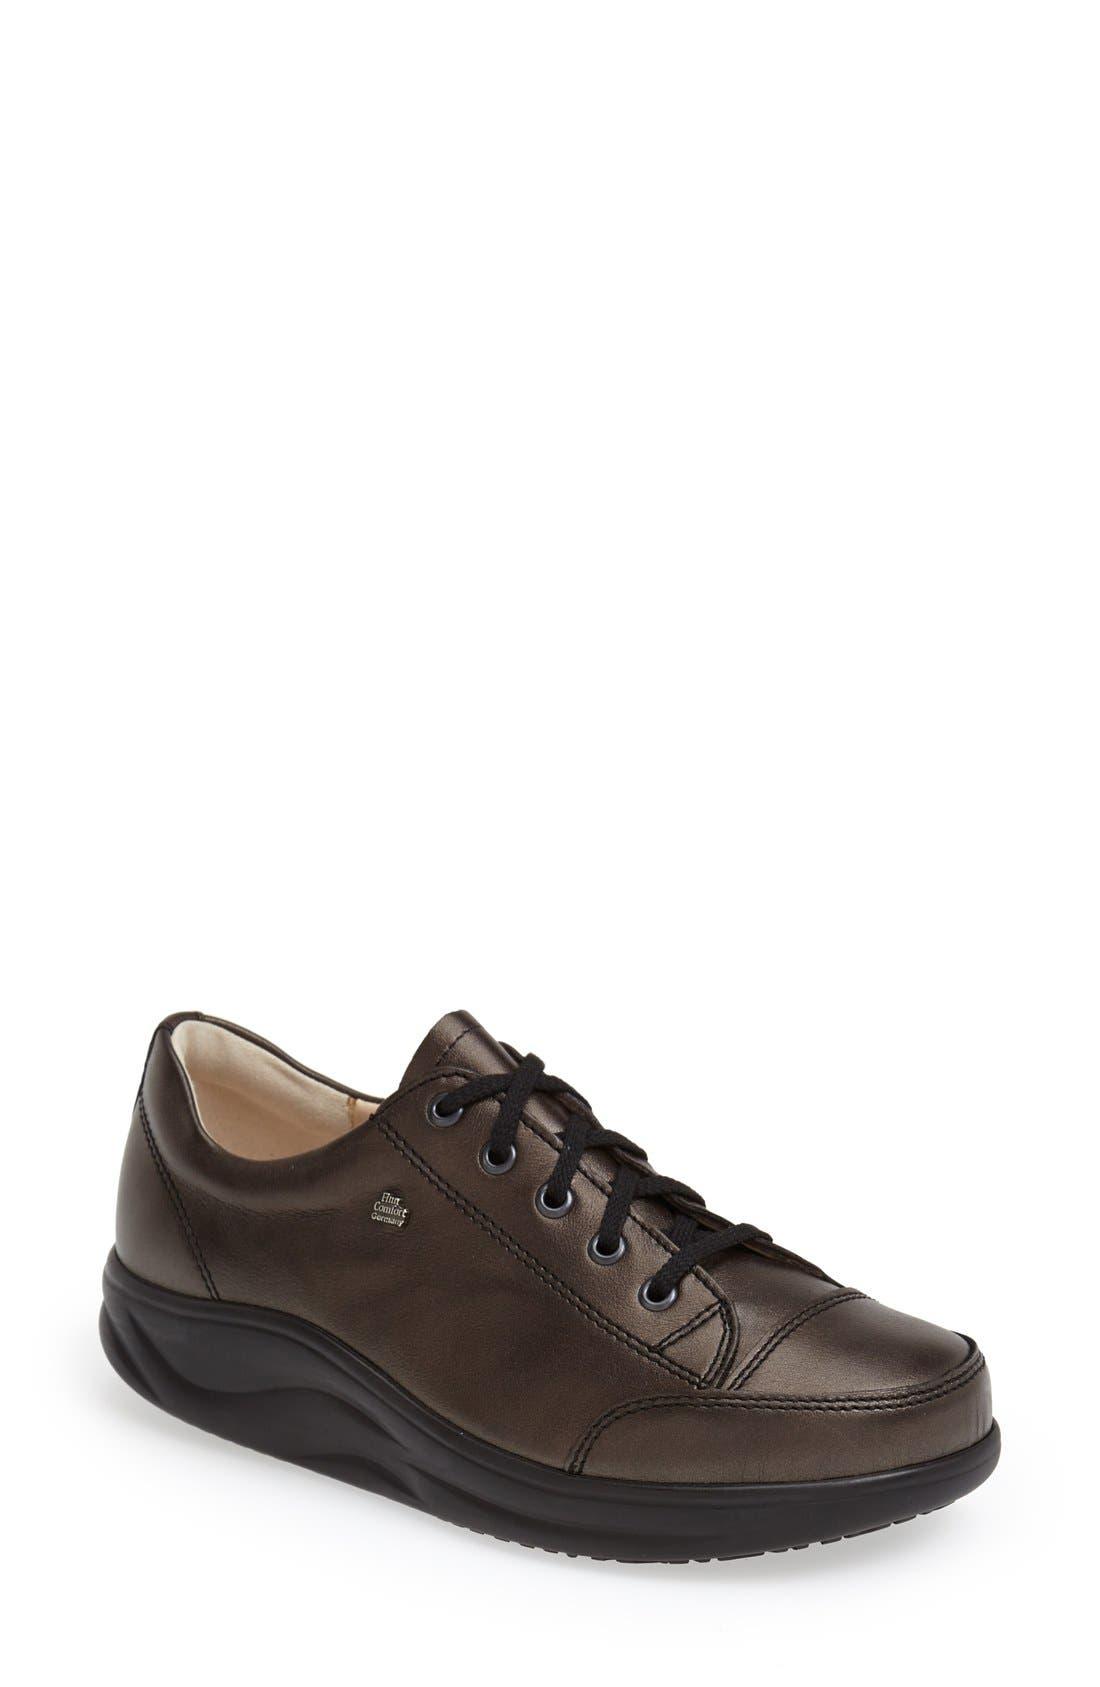 finnamic by finn comfort ikebukuro walking shoe nordstrom